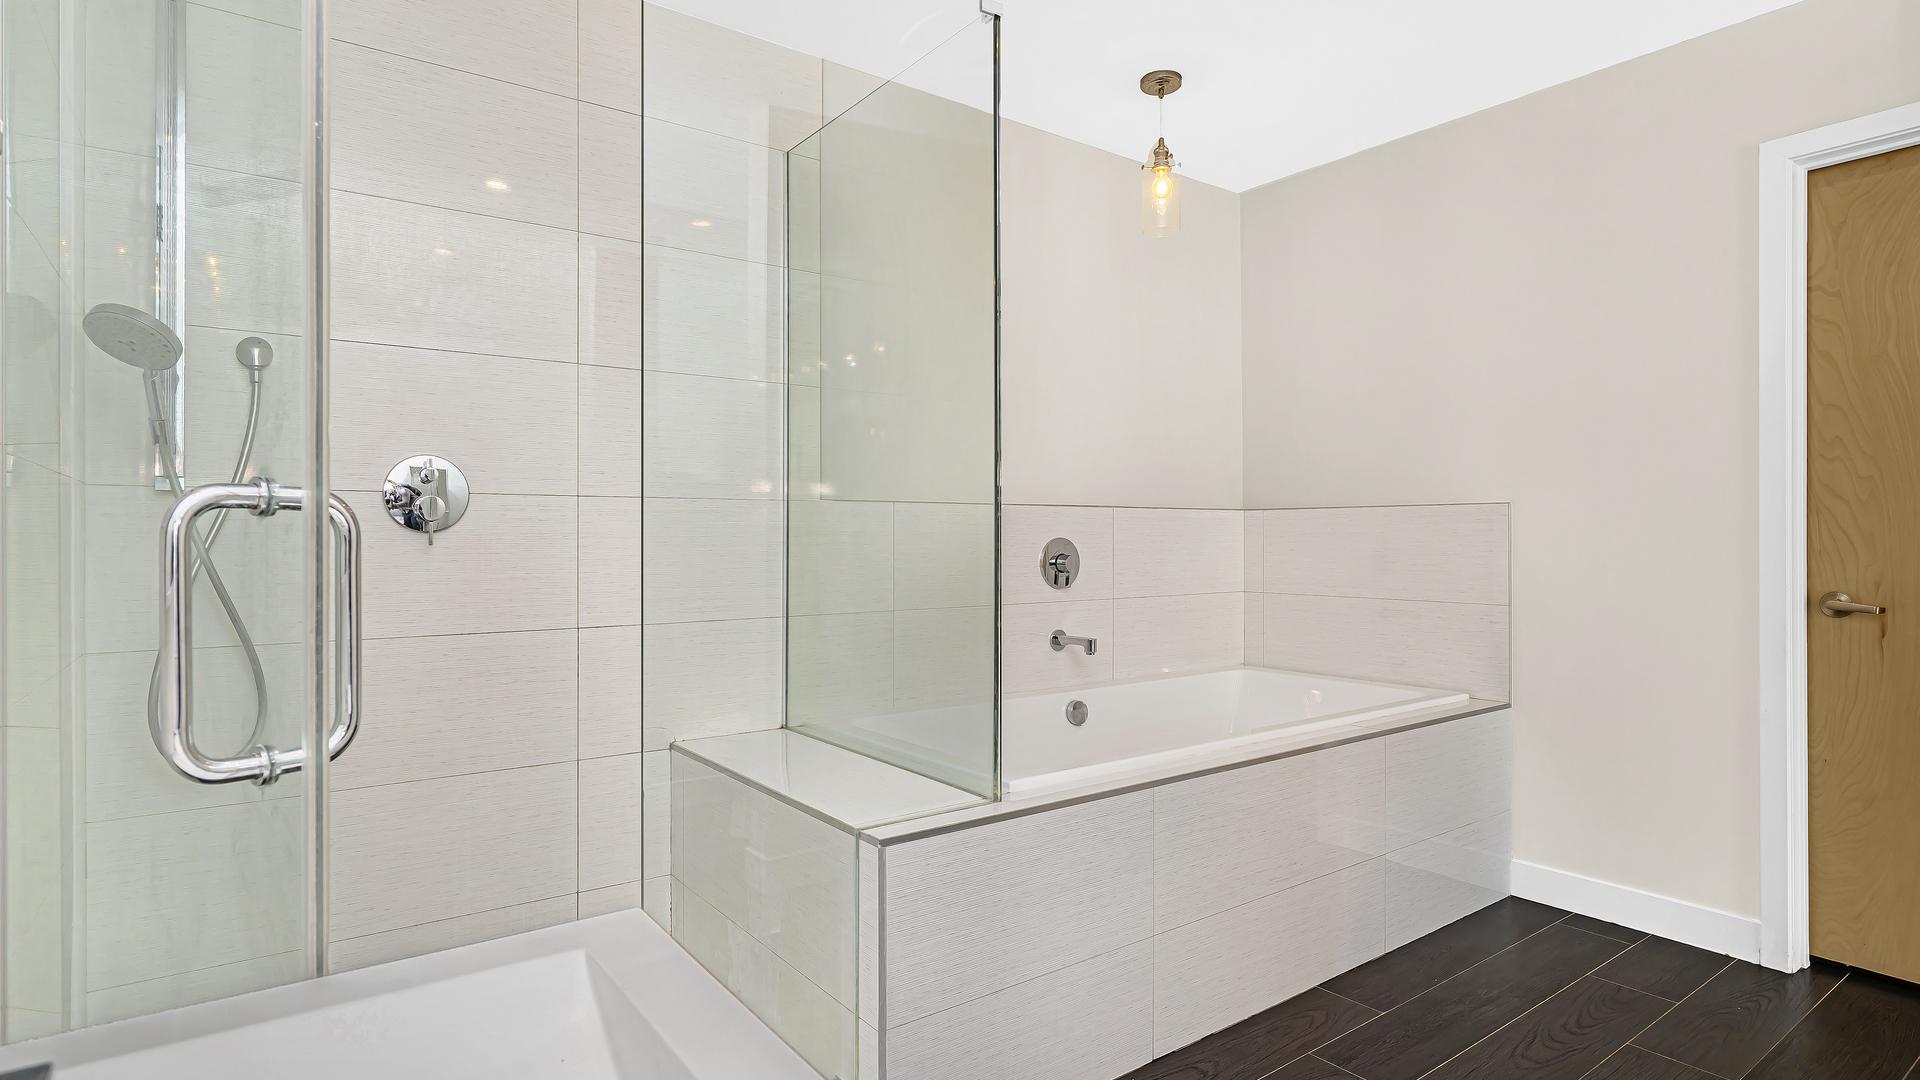 1214 N Wood St apartments for rent at AptAmigo